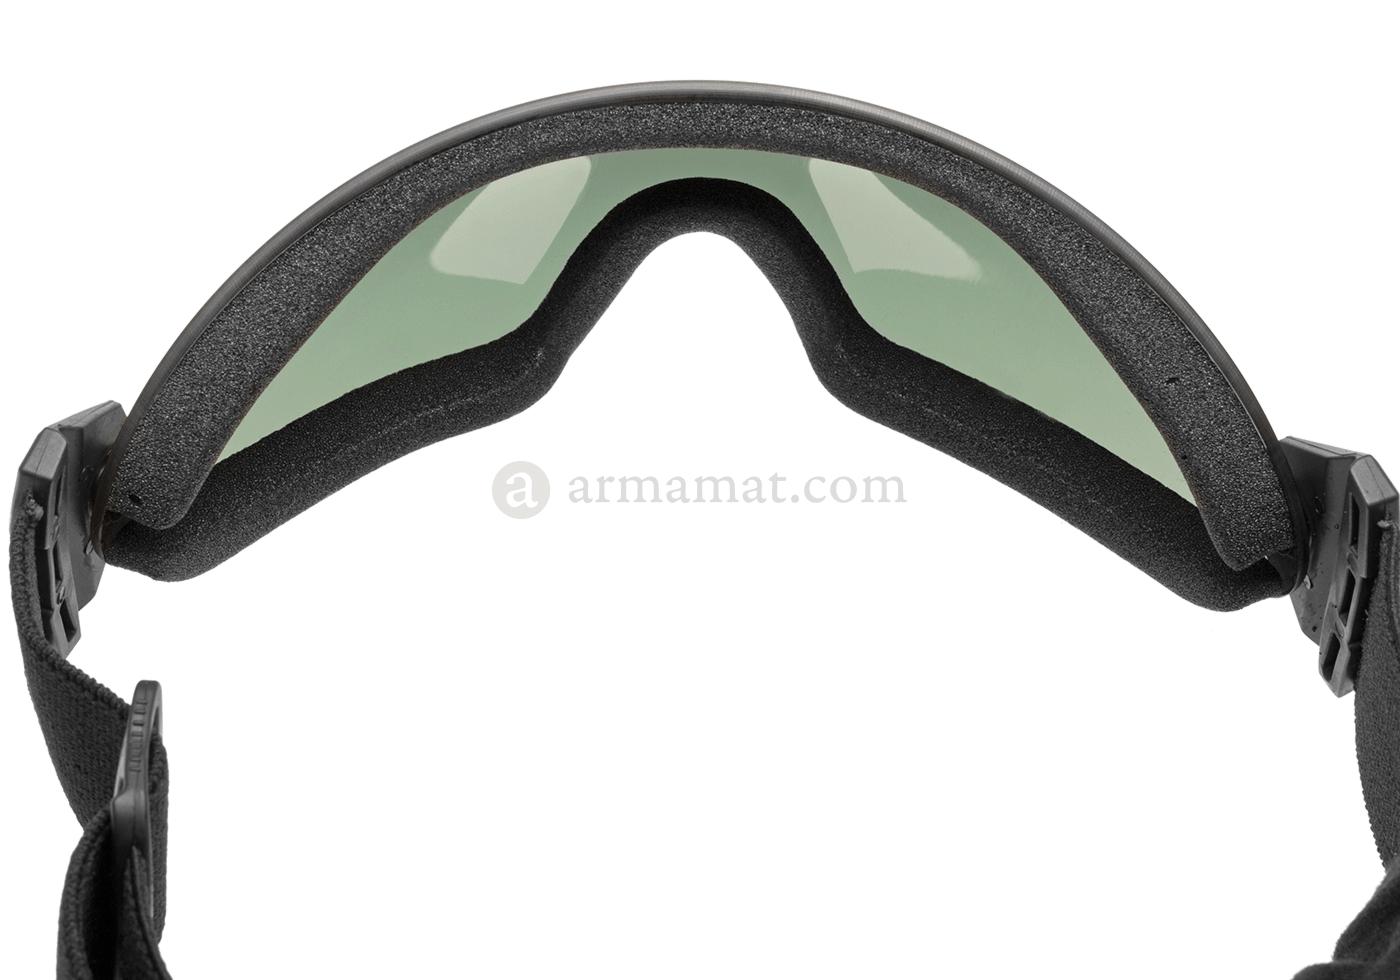 88a1e9639605c Boogie SOEP Grey Black (Smith Optics) - Goggles - Brillen -  Schutzausrüstung - armamat.com Onlineshop